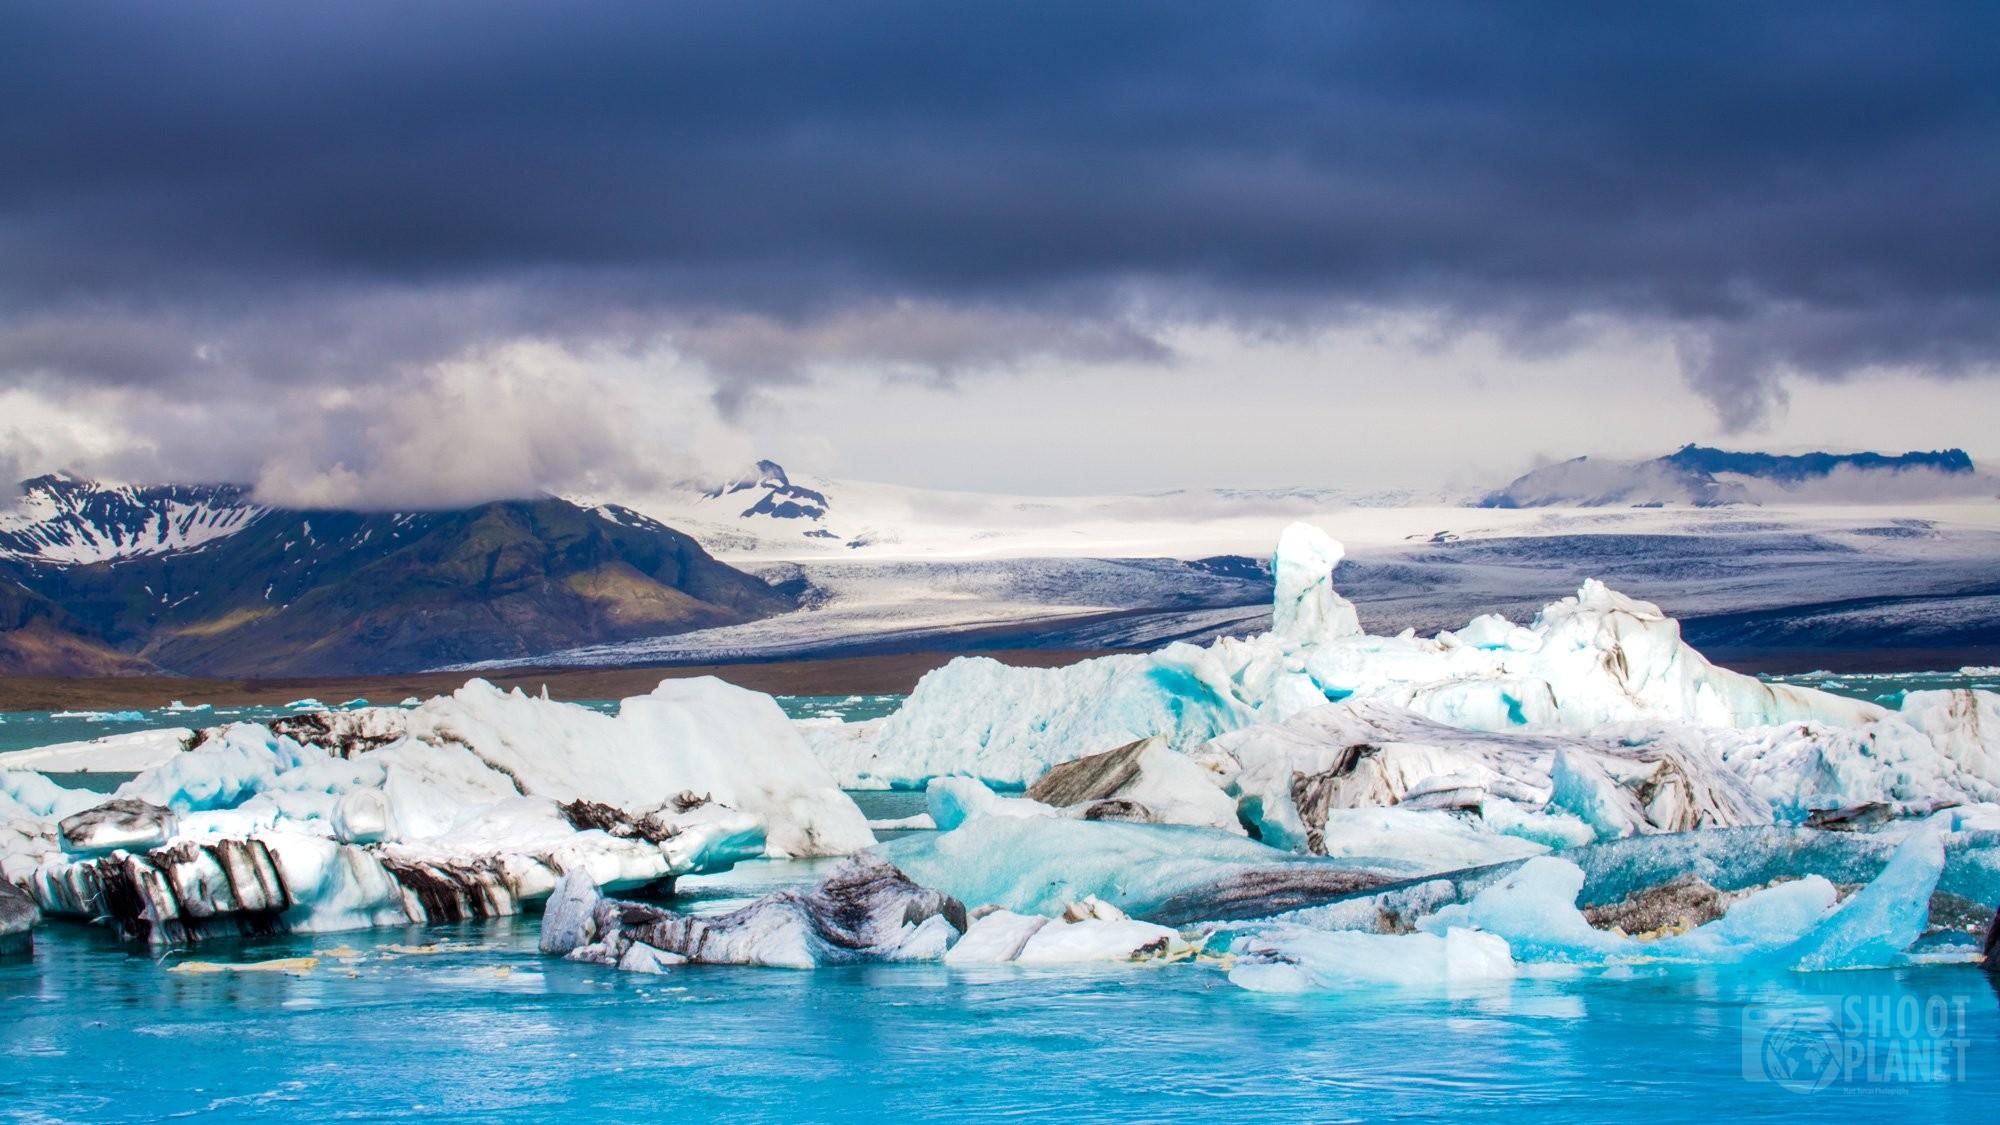 Jokulsarlon lagoon icebergs and glacier, Iceland